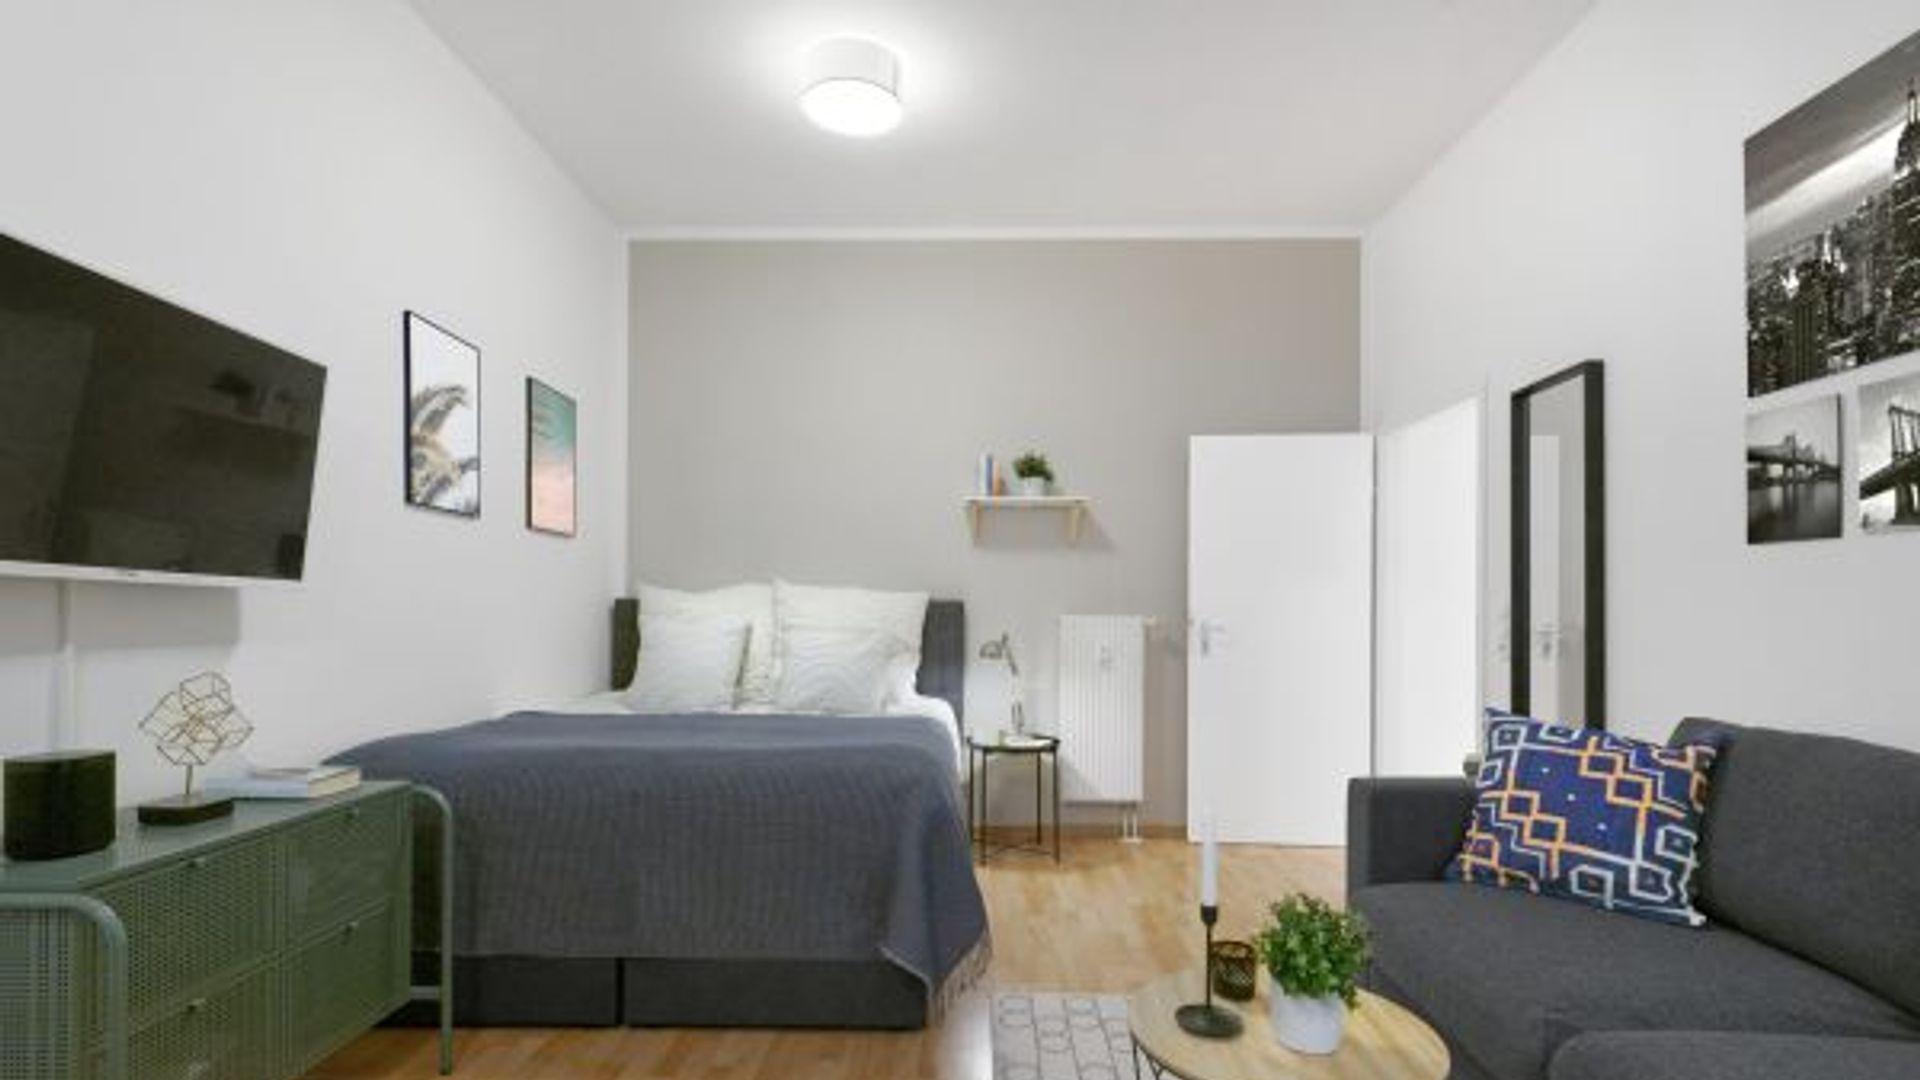 1 bed apartment at Sonnenburger Straße 66, 10437 Berlin ...